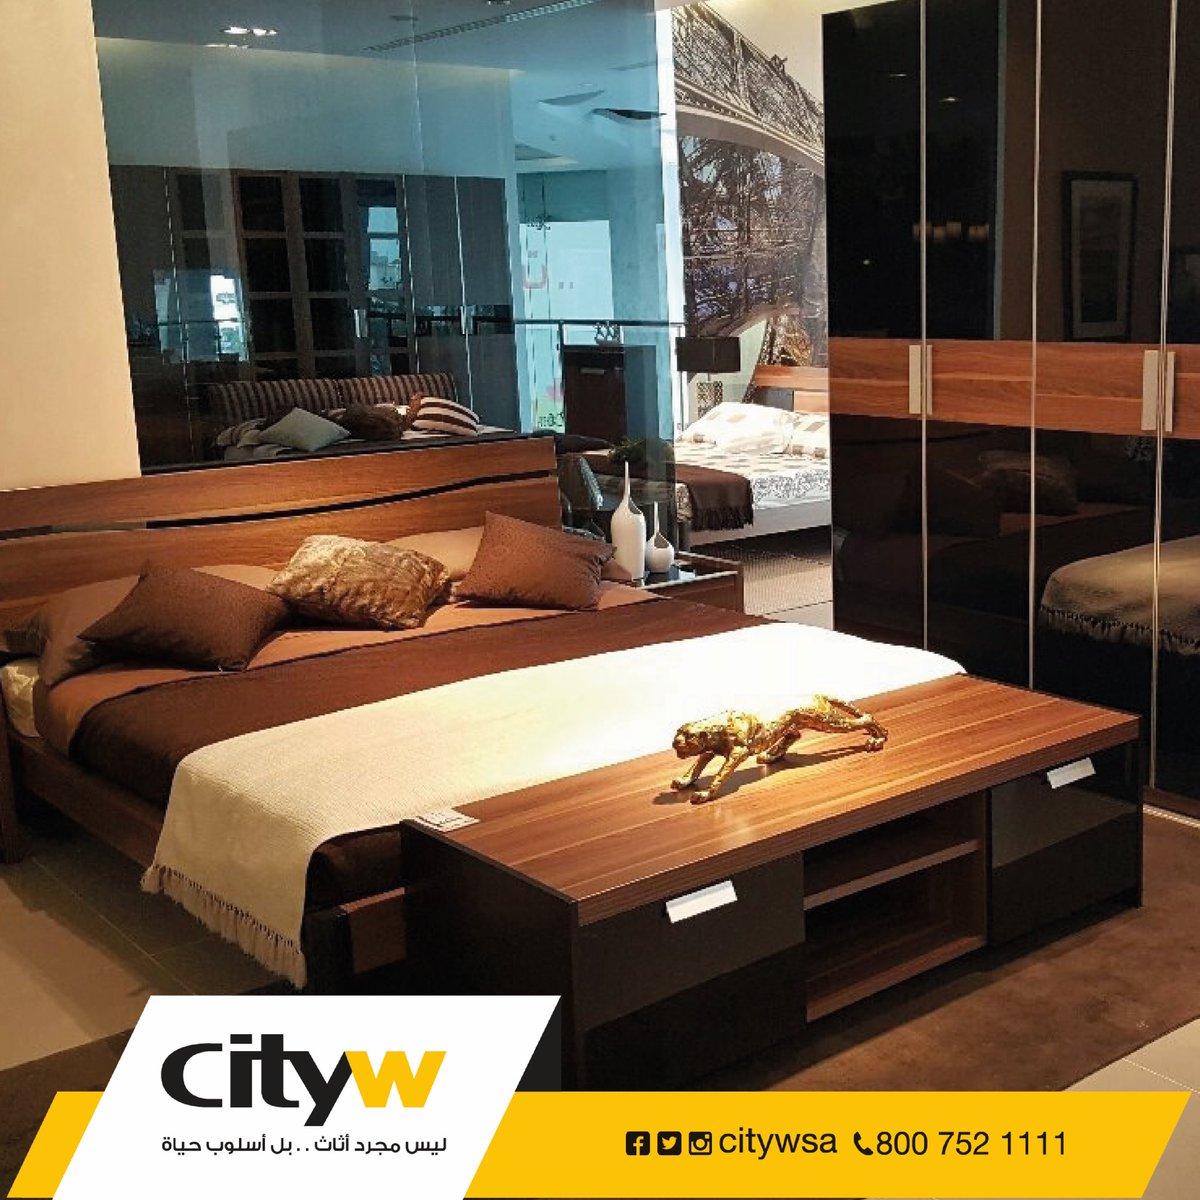 Cityw سيتي دبليو Tren Twitter أرقى الاختيارات لغرفة نومك سيتي دبليو الرياض جدة الخبر Cityw Https T Co Ixtjlgcezr